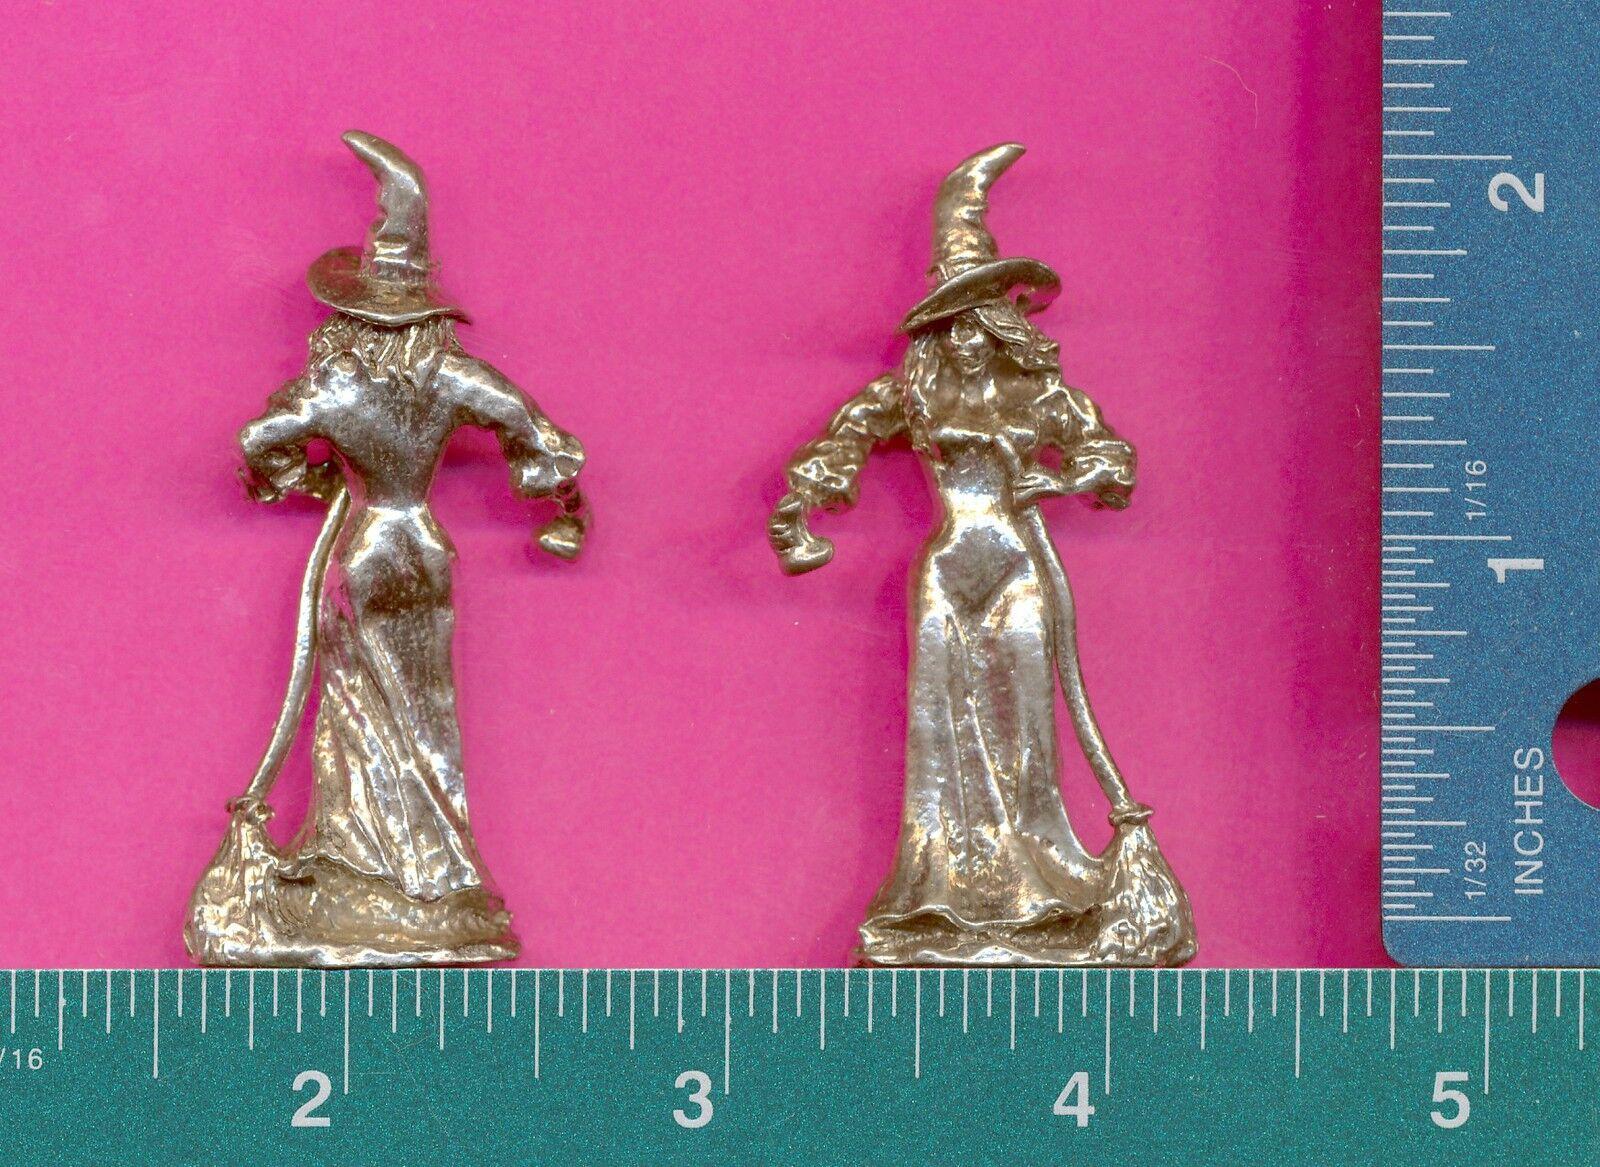 4 wholesale pewter mermaid dolphin figurines E5017